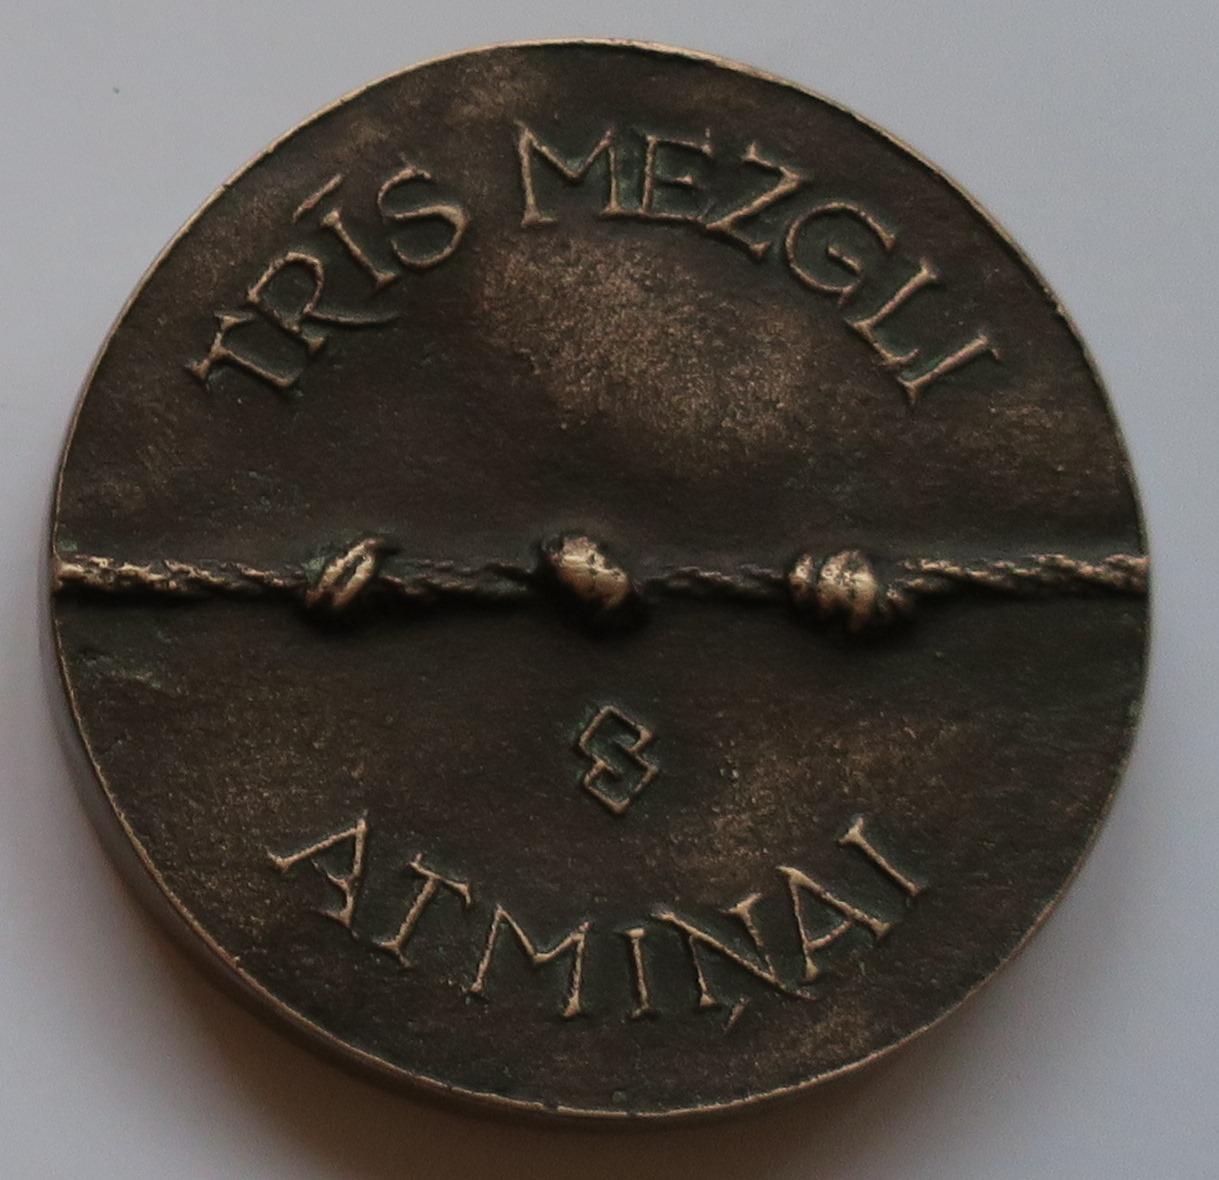 J_A_Simana_medala_Tris_mezgli_atminai.jpg